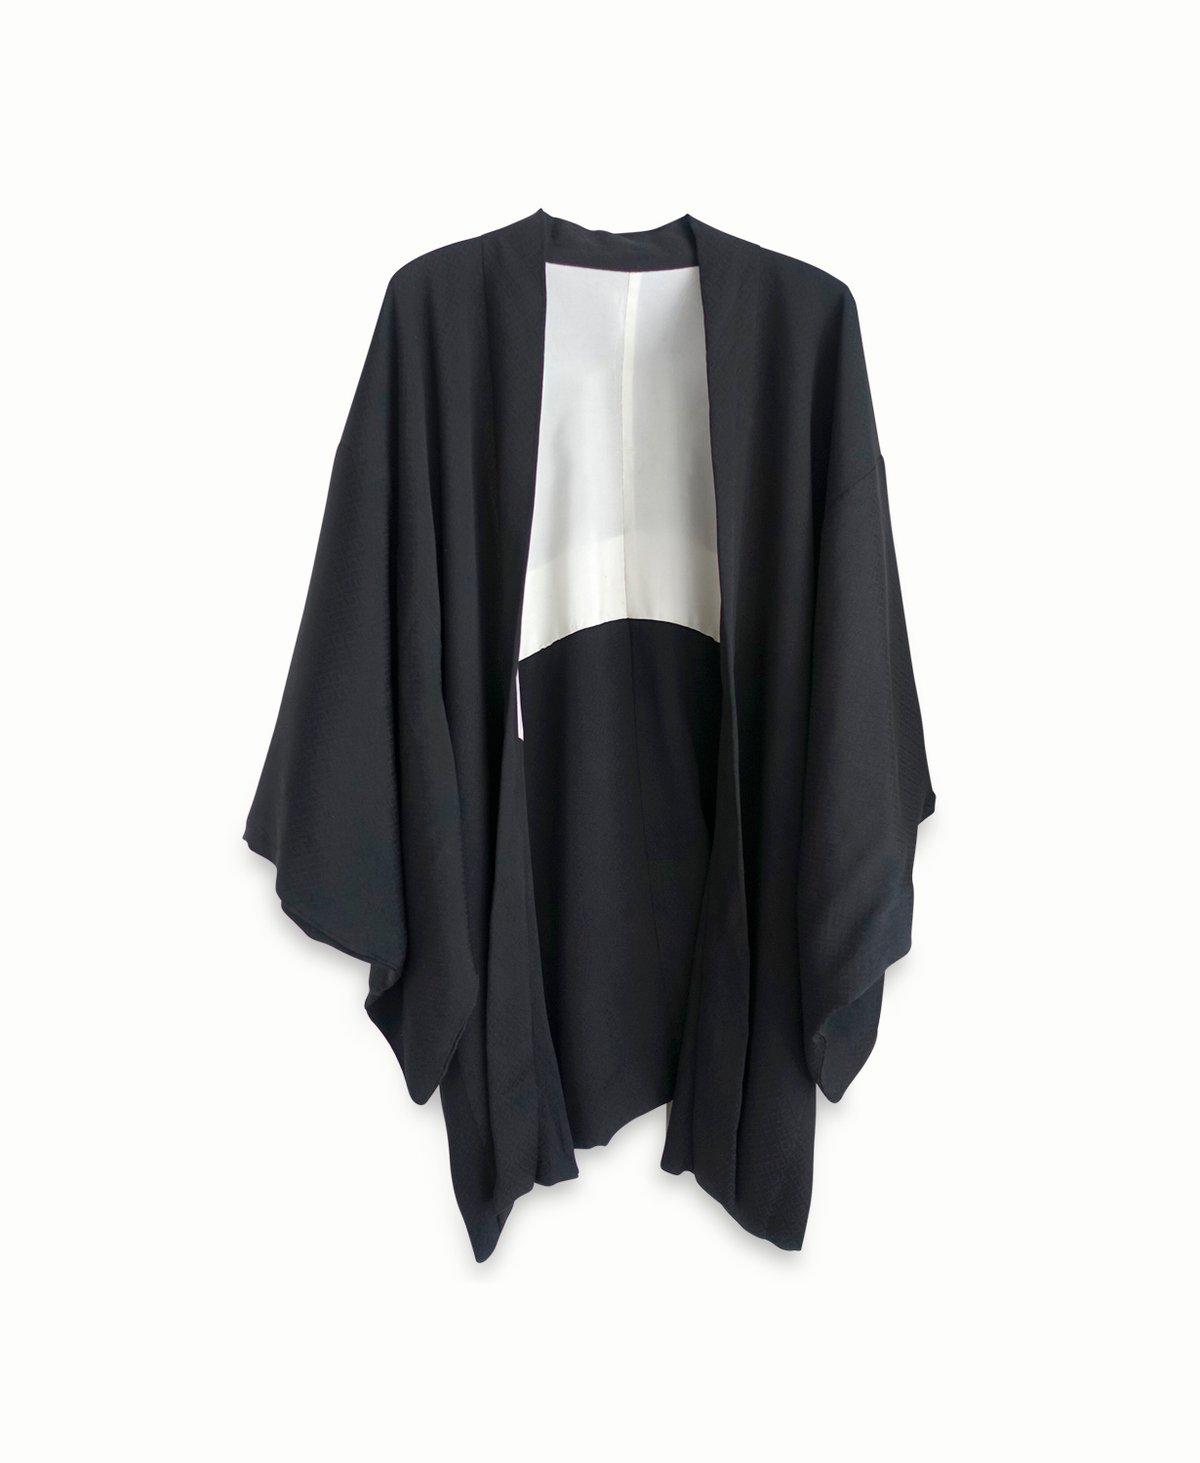 Image of Kort sort silke kimono - nedsat